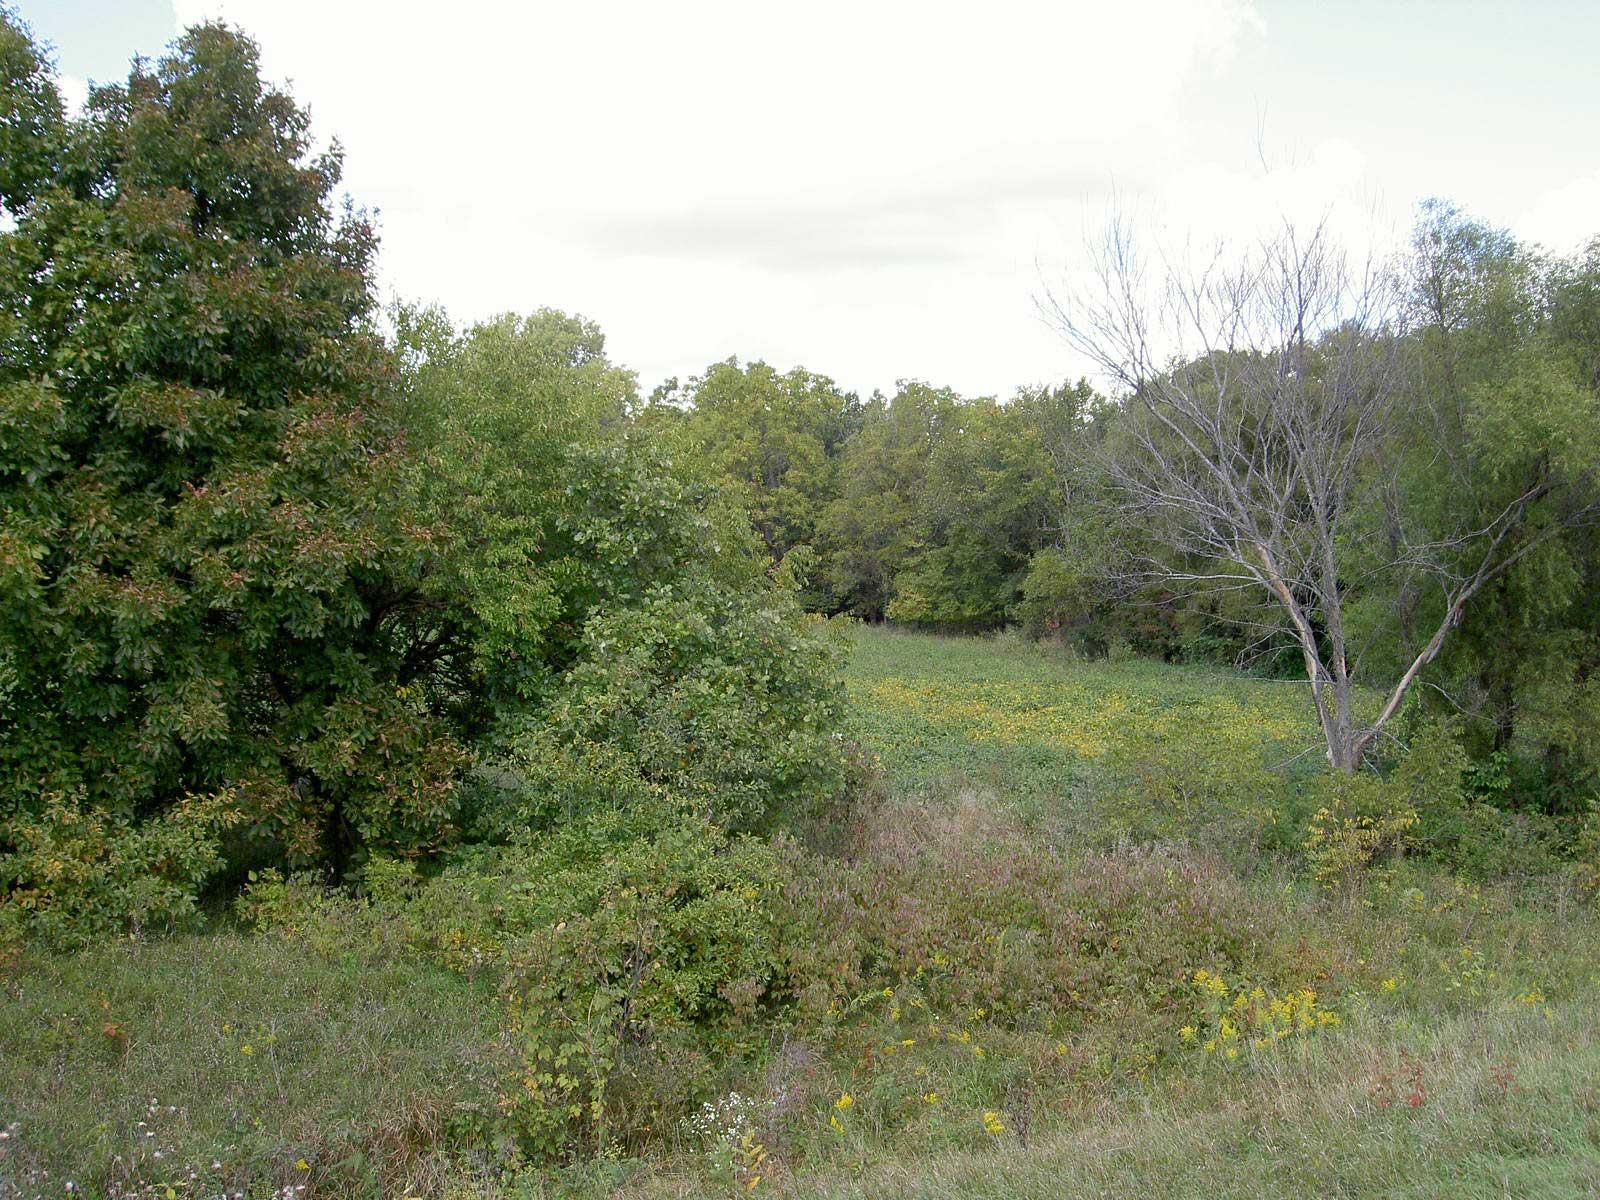 Six miles north of St. Joseph, Missouri